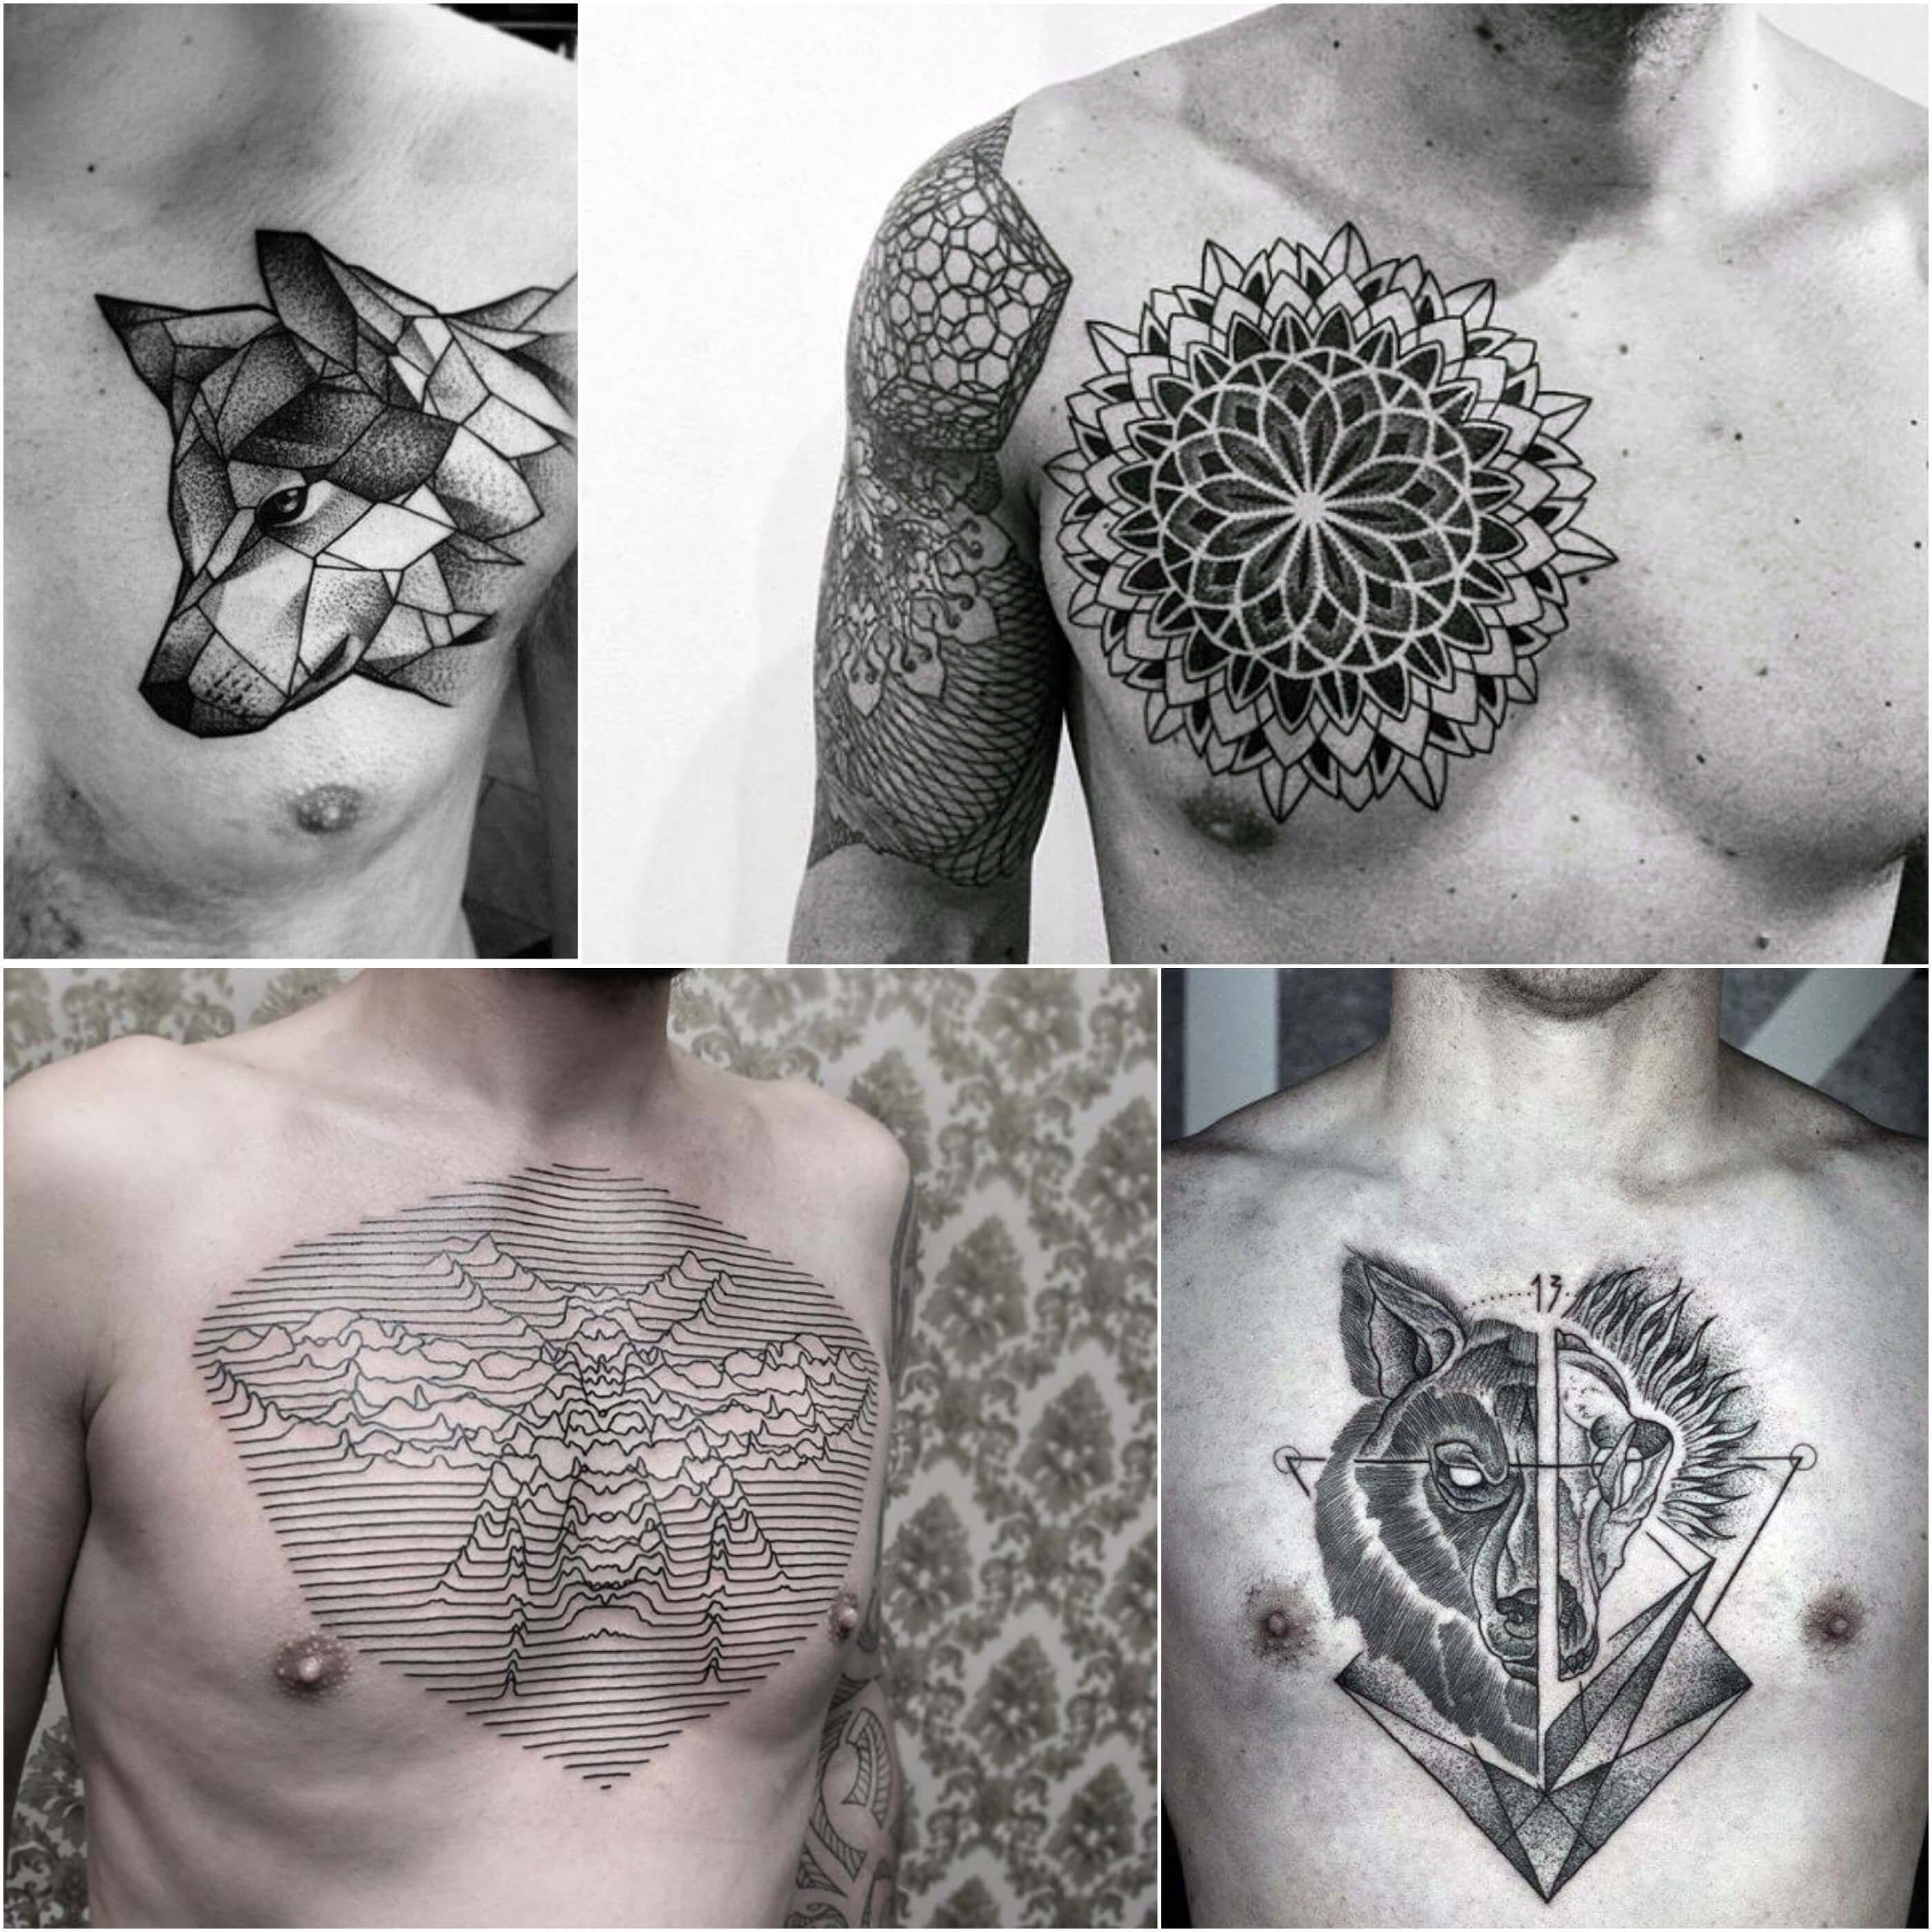 tattoos for men on neck Tattoosformen Tattoos for guys